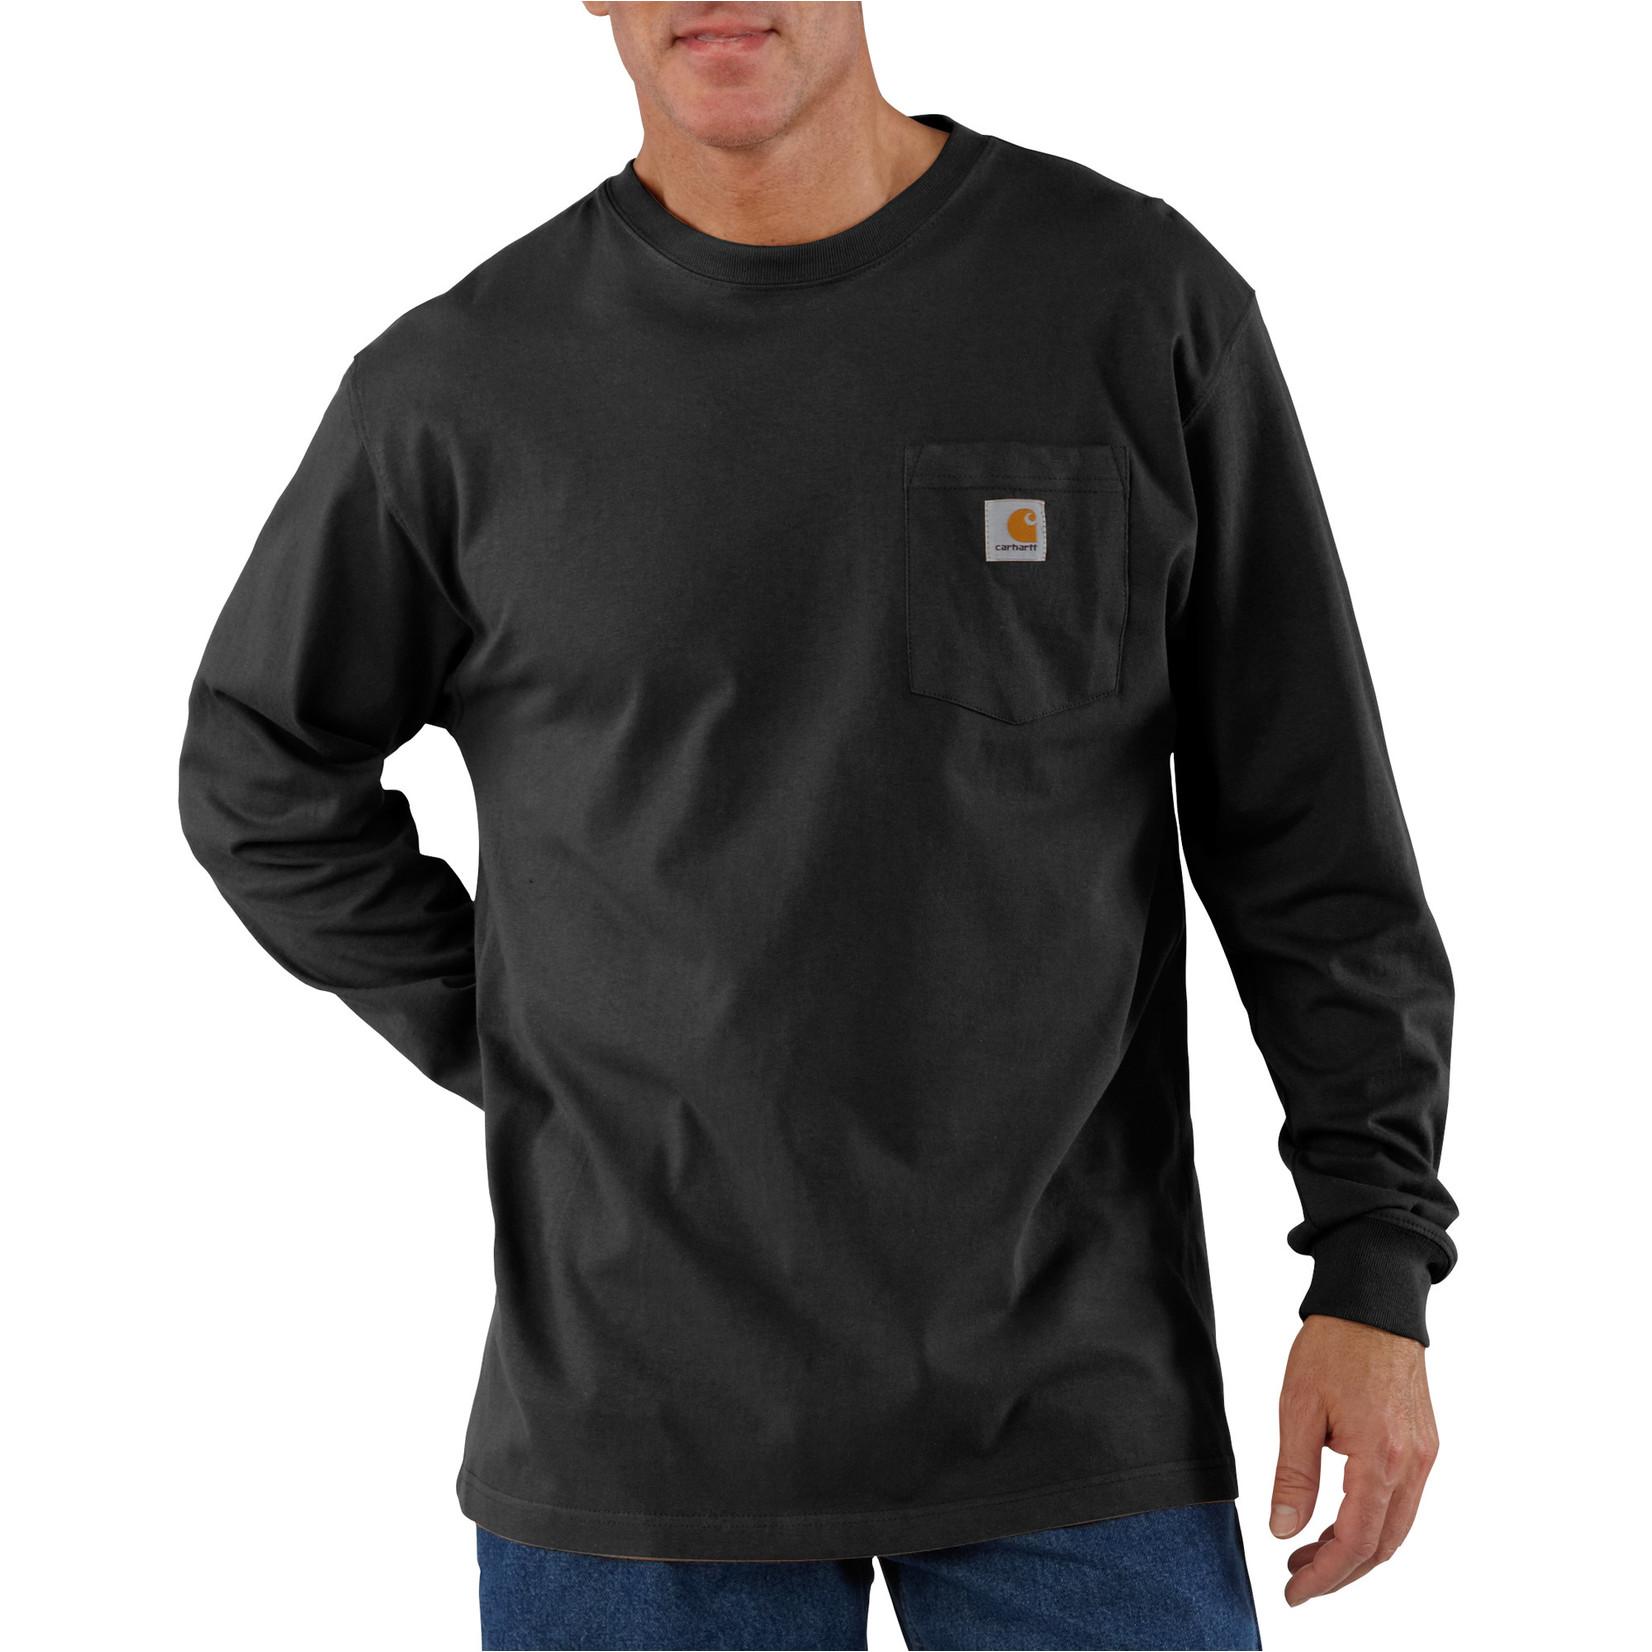 Carhartt Carhartt K126 Workwear Long-Sleeve Shirt with Pocket